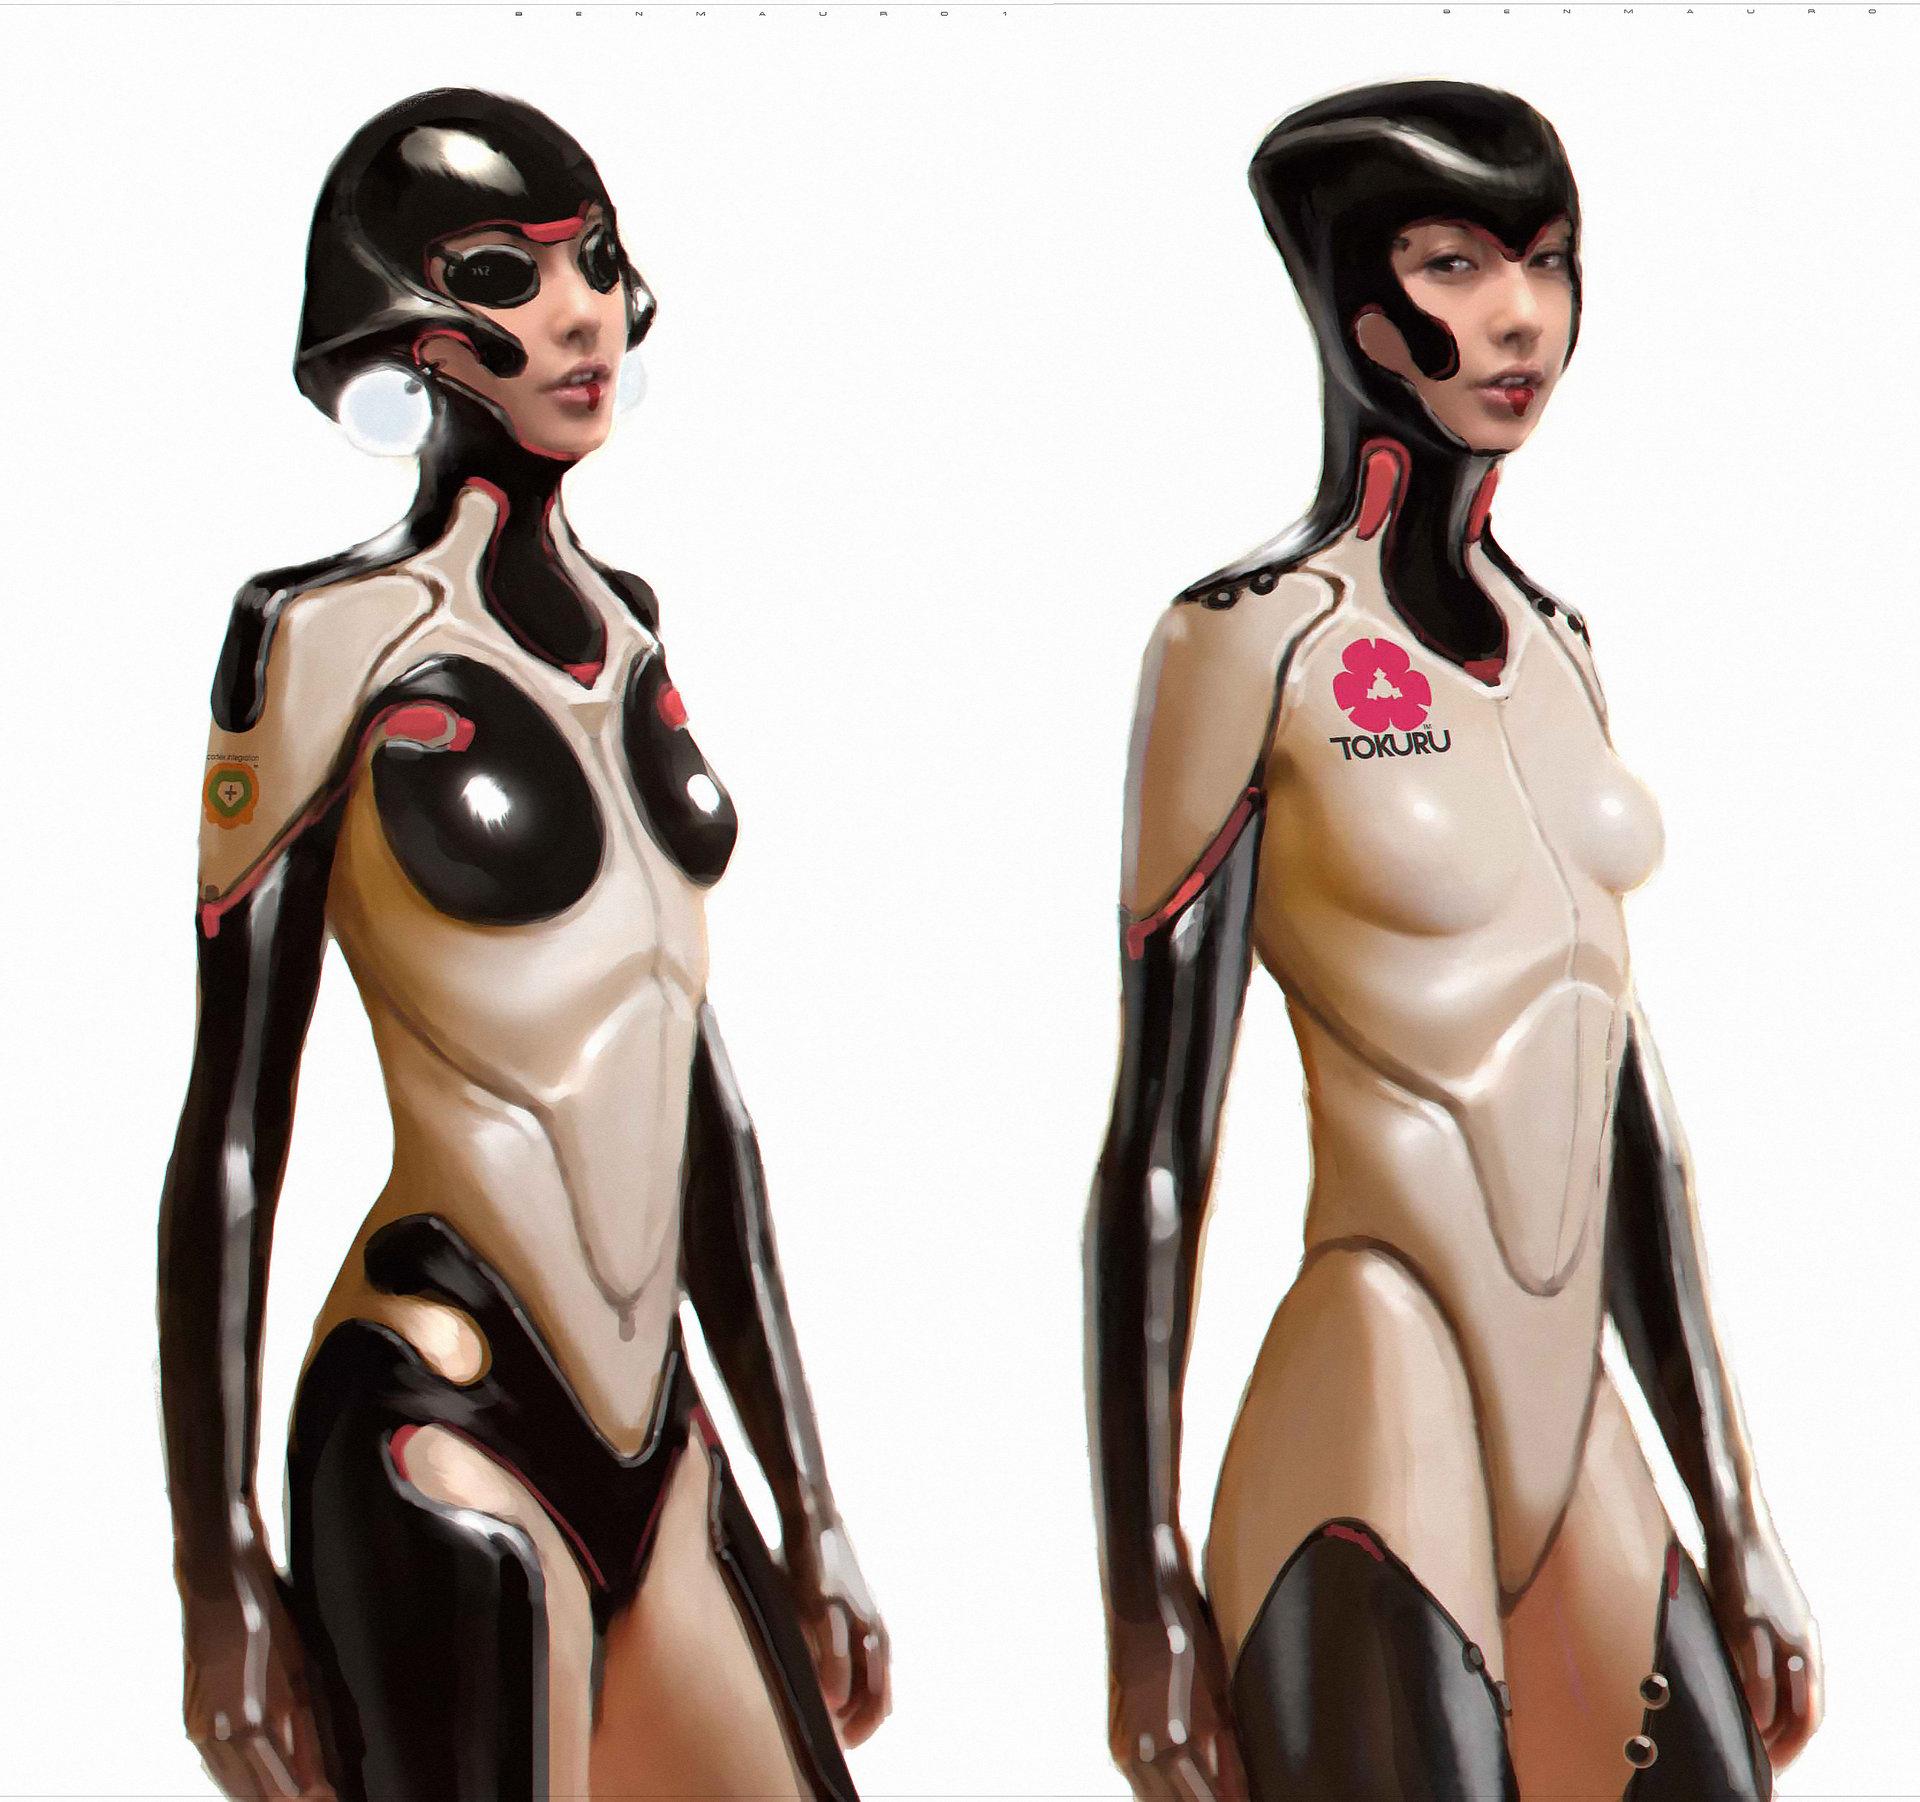 Ben mauro sexybot 02 bm